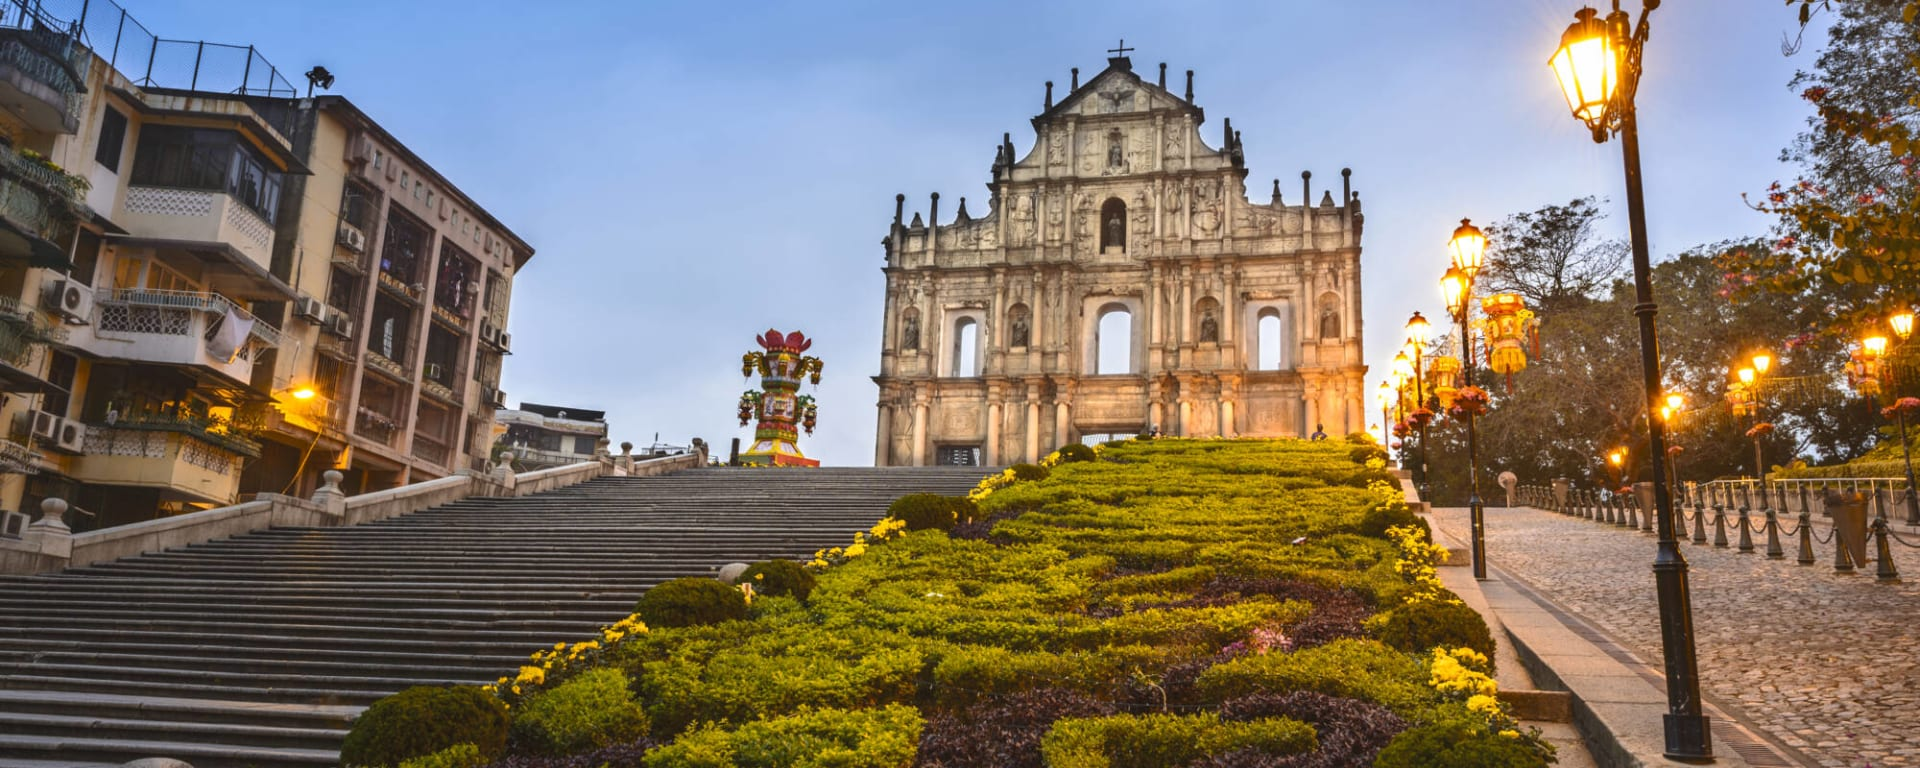 Macau entdecken mit Tischler Reisen: Macau Altstadt St Pauls